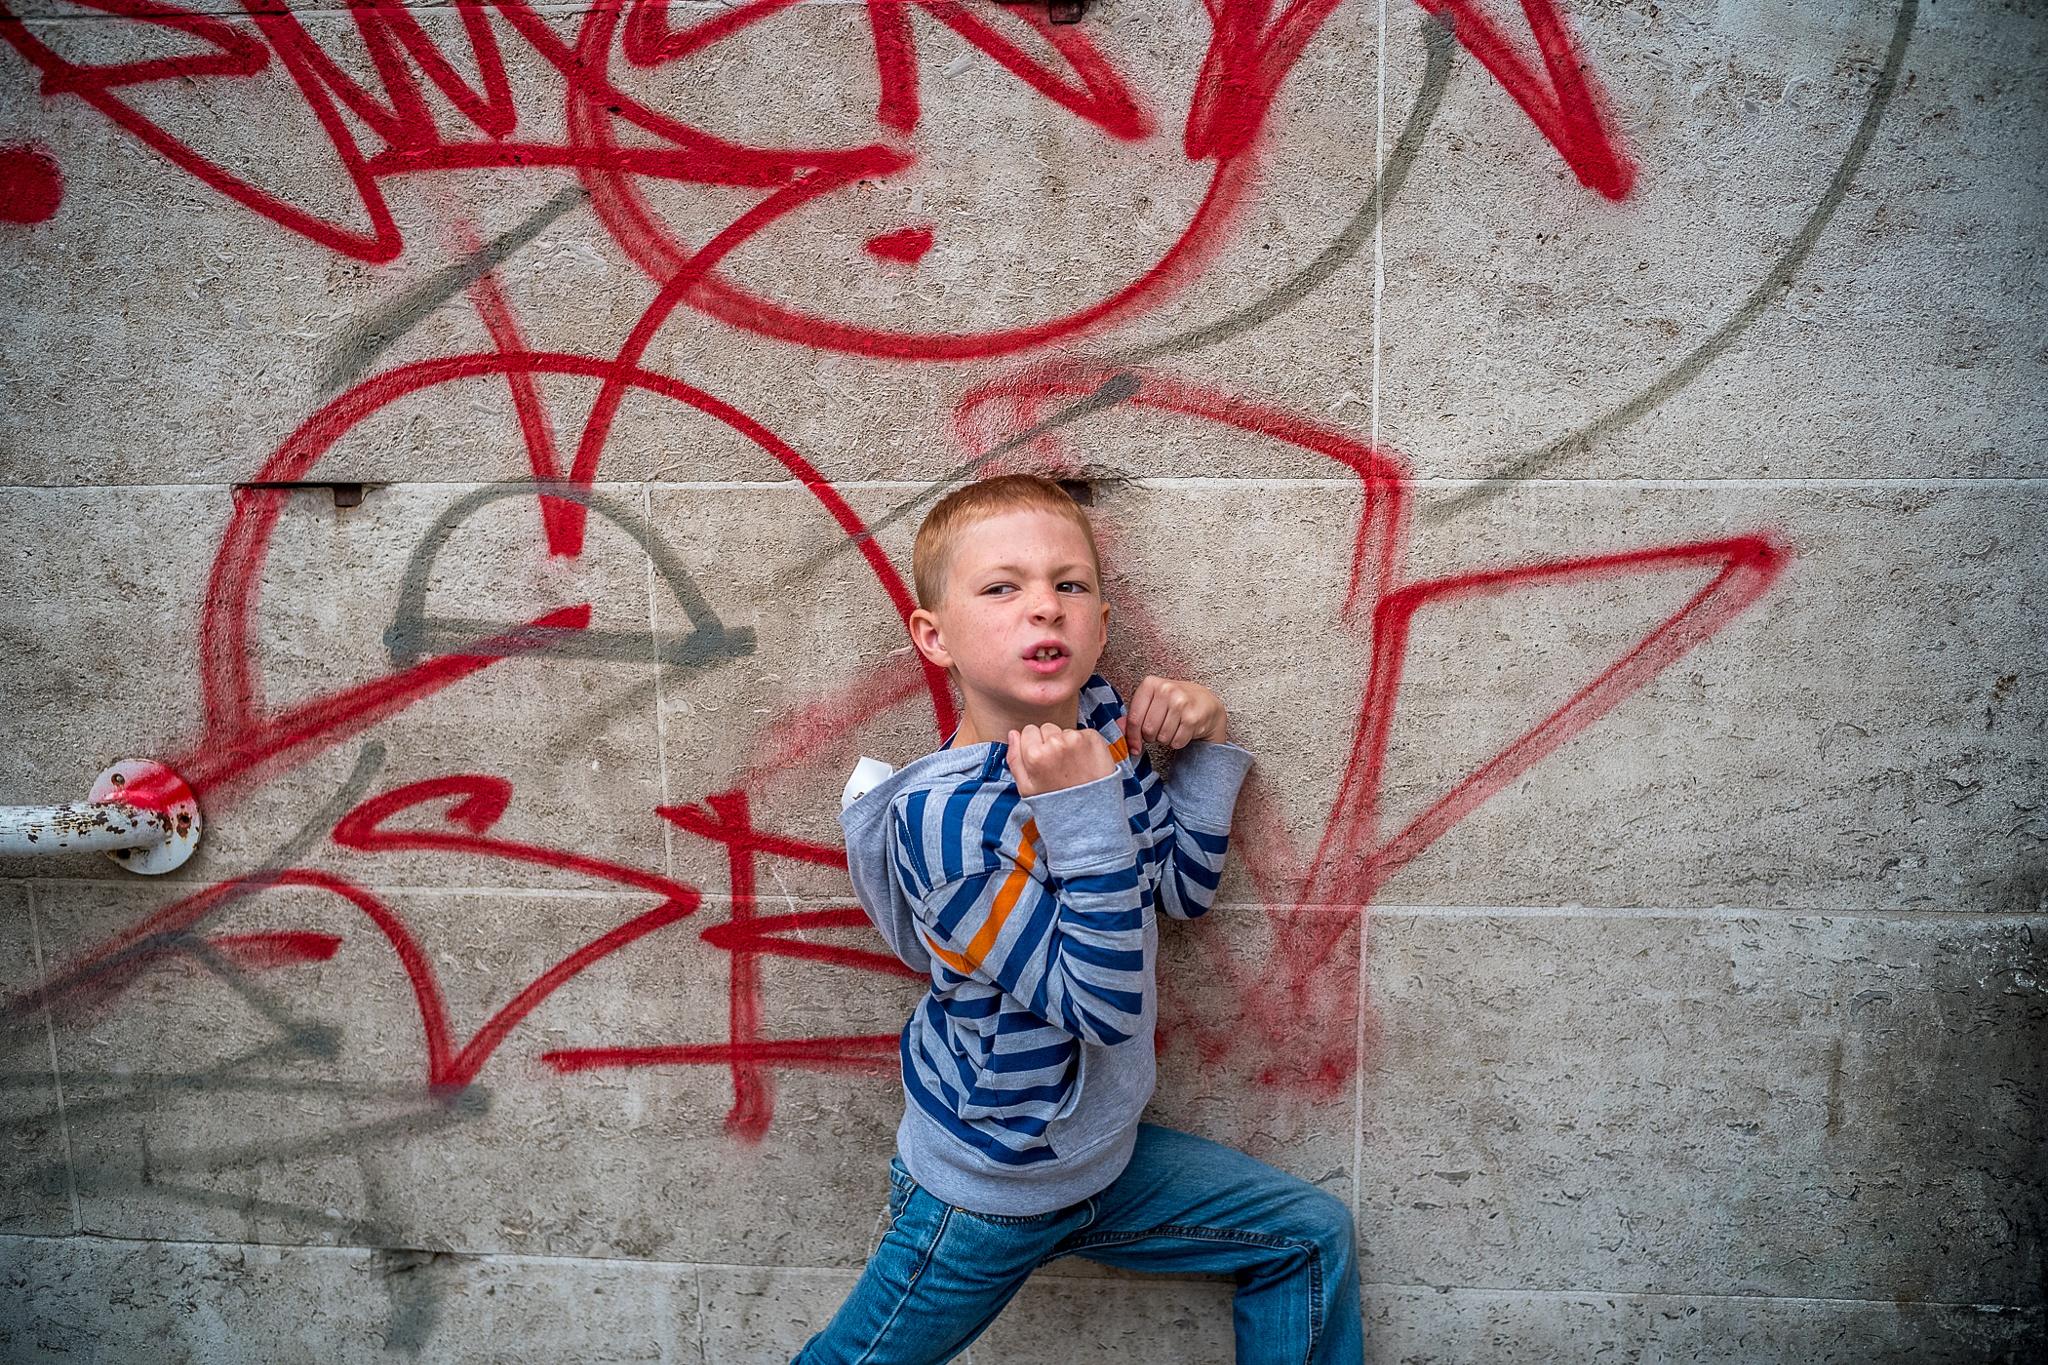 "Young Urban ""Superhero"" Boy by mike hughes"